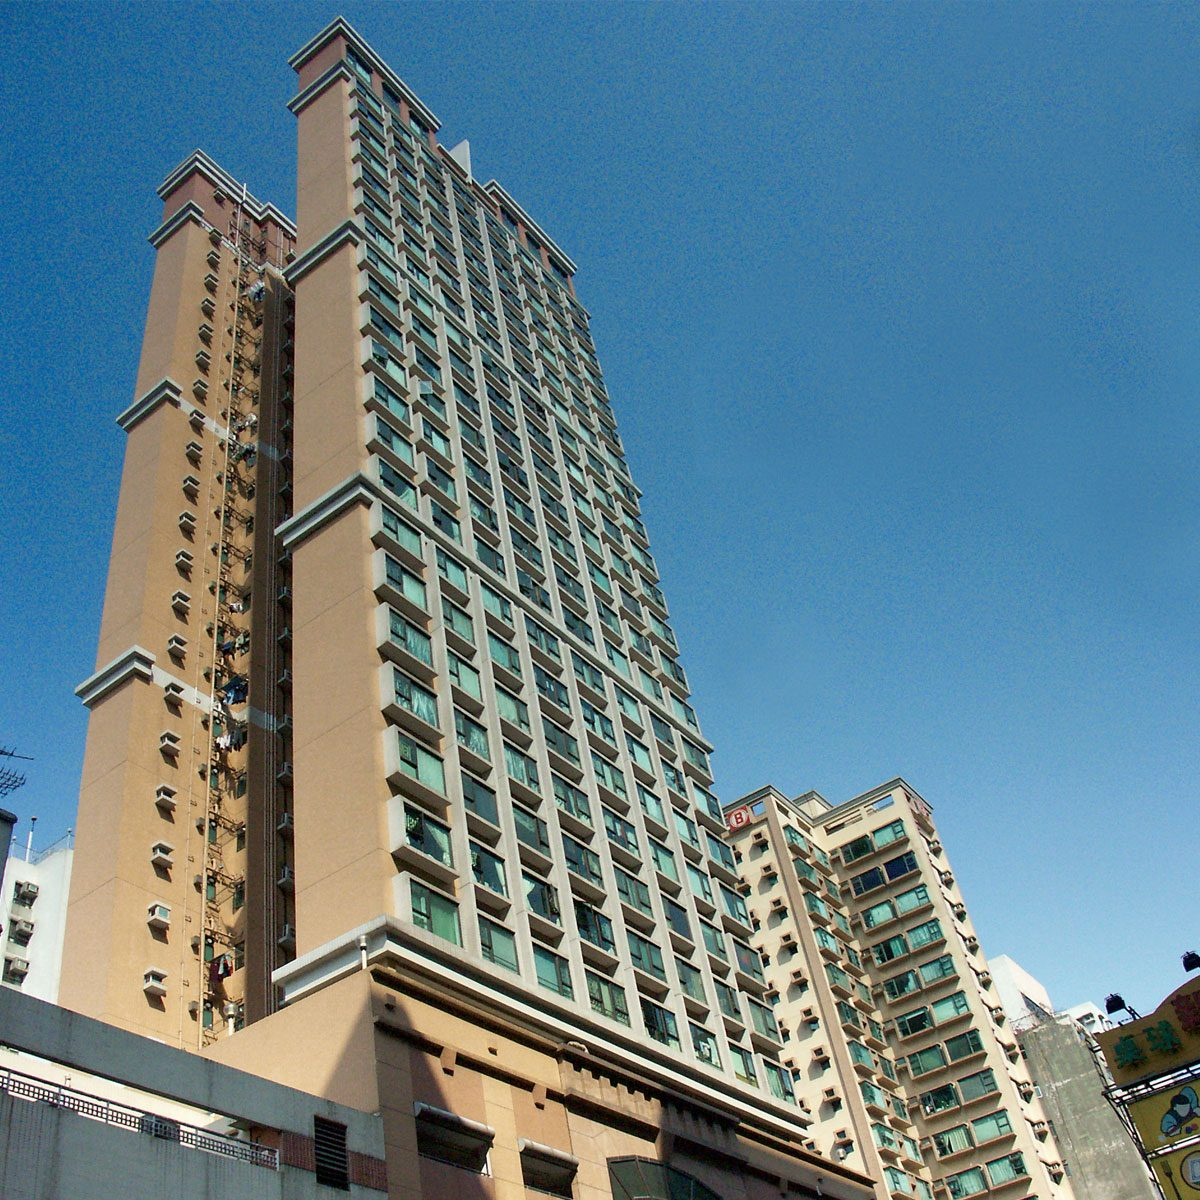 Carlton Court, Residential Development at 80 Ma Tau Wai Road, HungHom, Kowloon